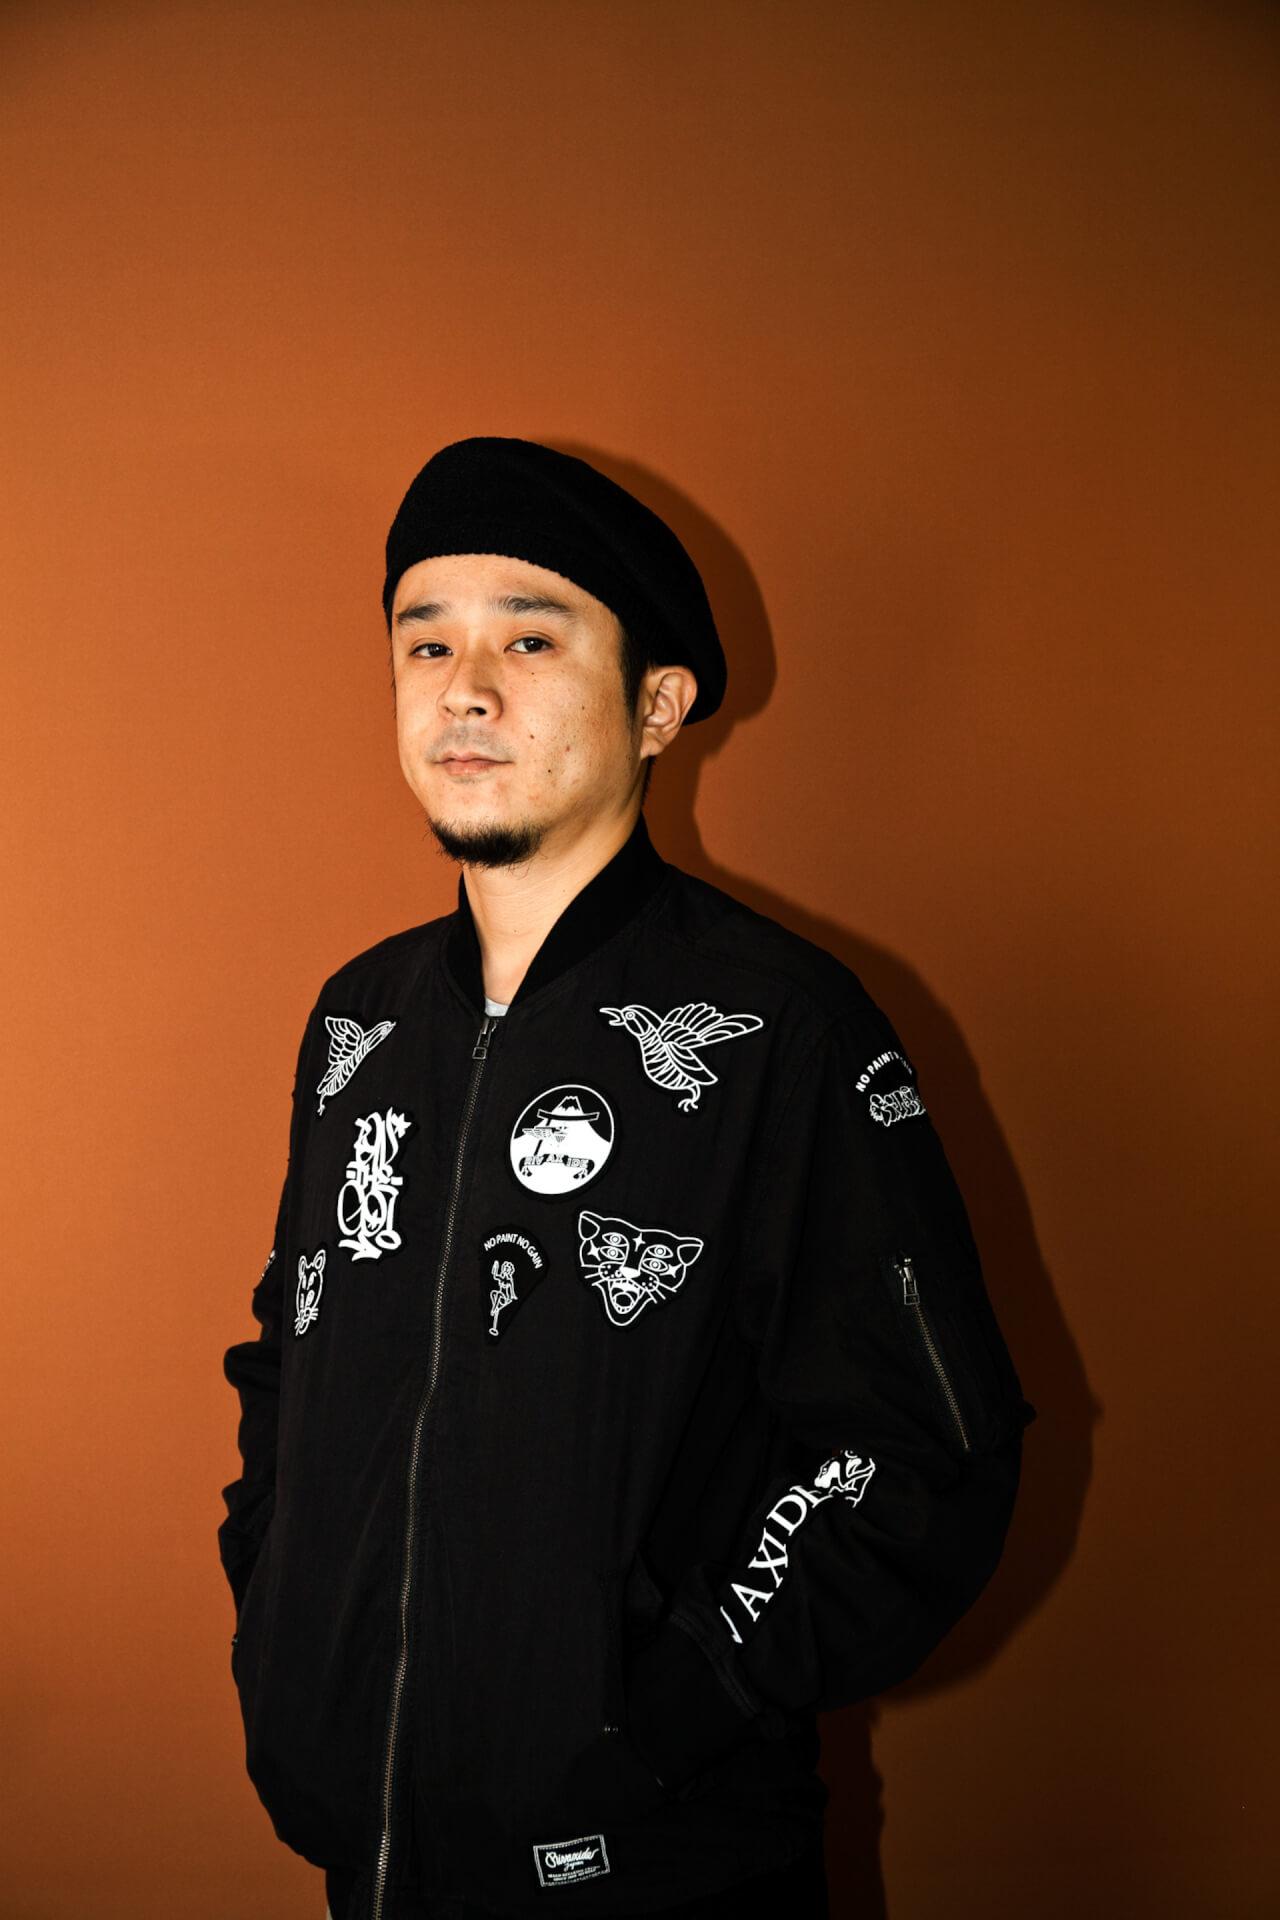 KOYANMUSICと西東京のビートメーカーB.T.Reo 440がジョイント・ビートテープ『Tasty!』のリリースを発表!ティザー映像が公開 music210511_koyanmusic-btreo440_2